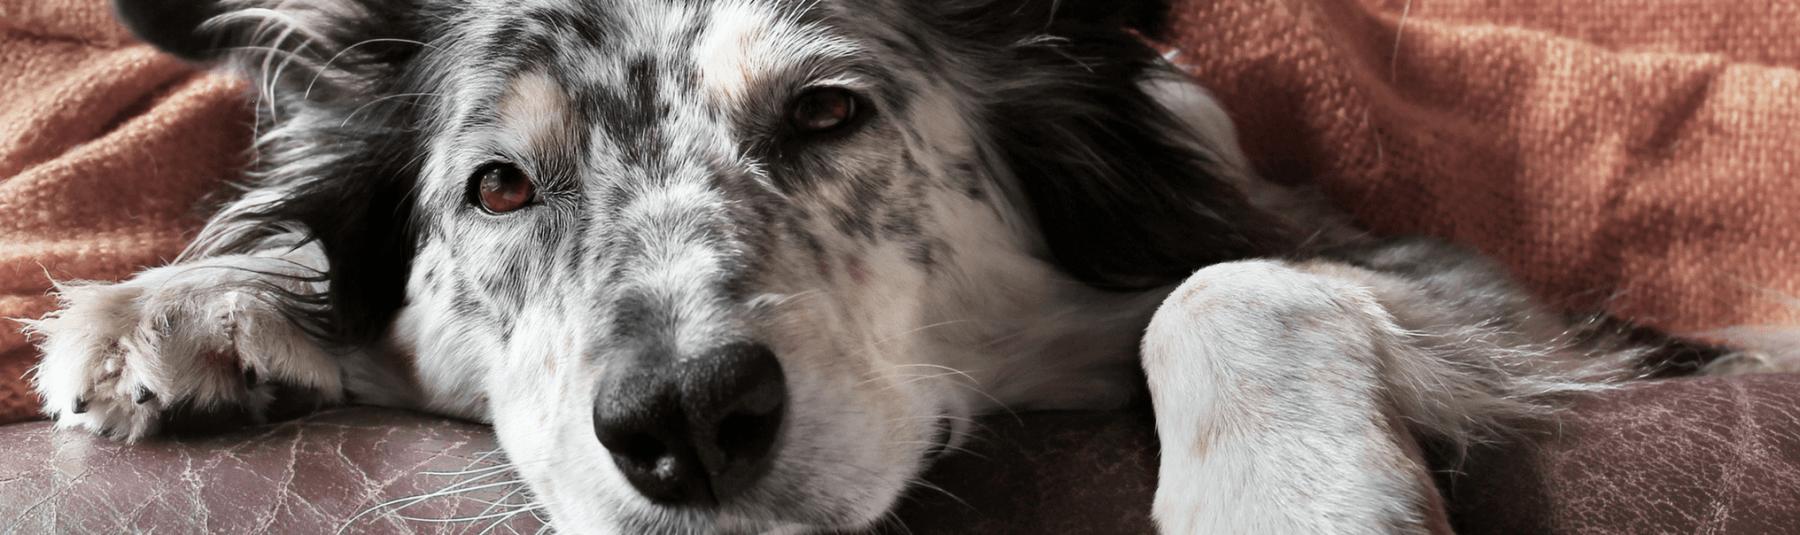 dog-chemo-service